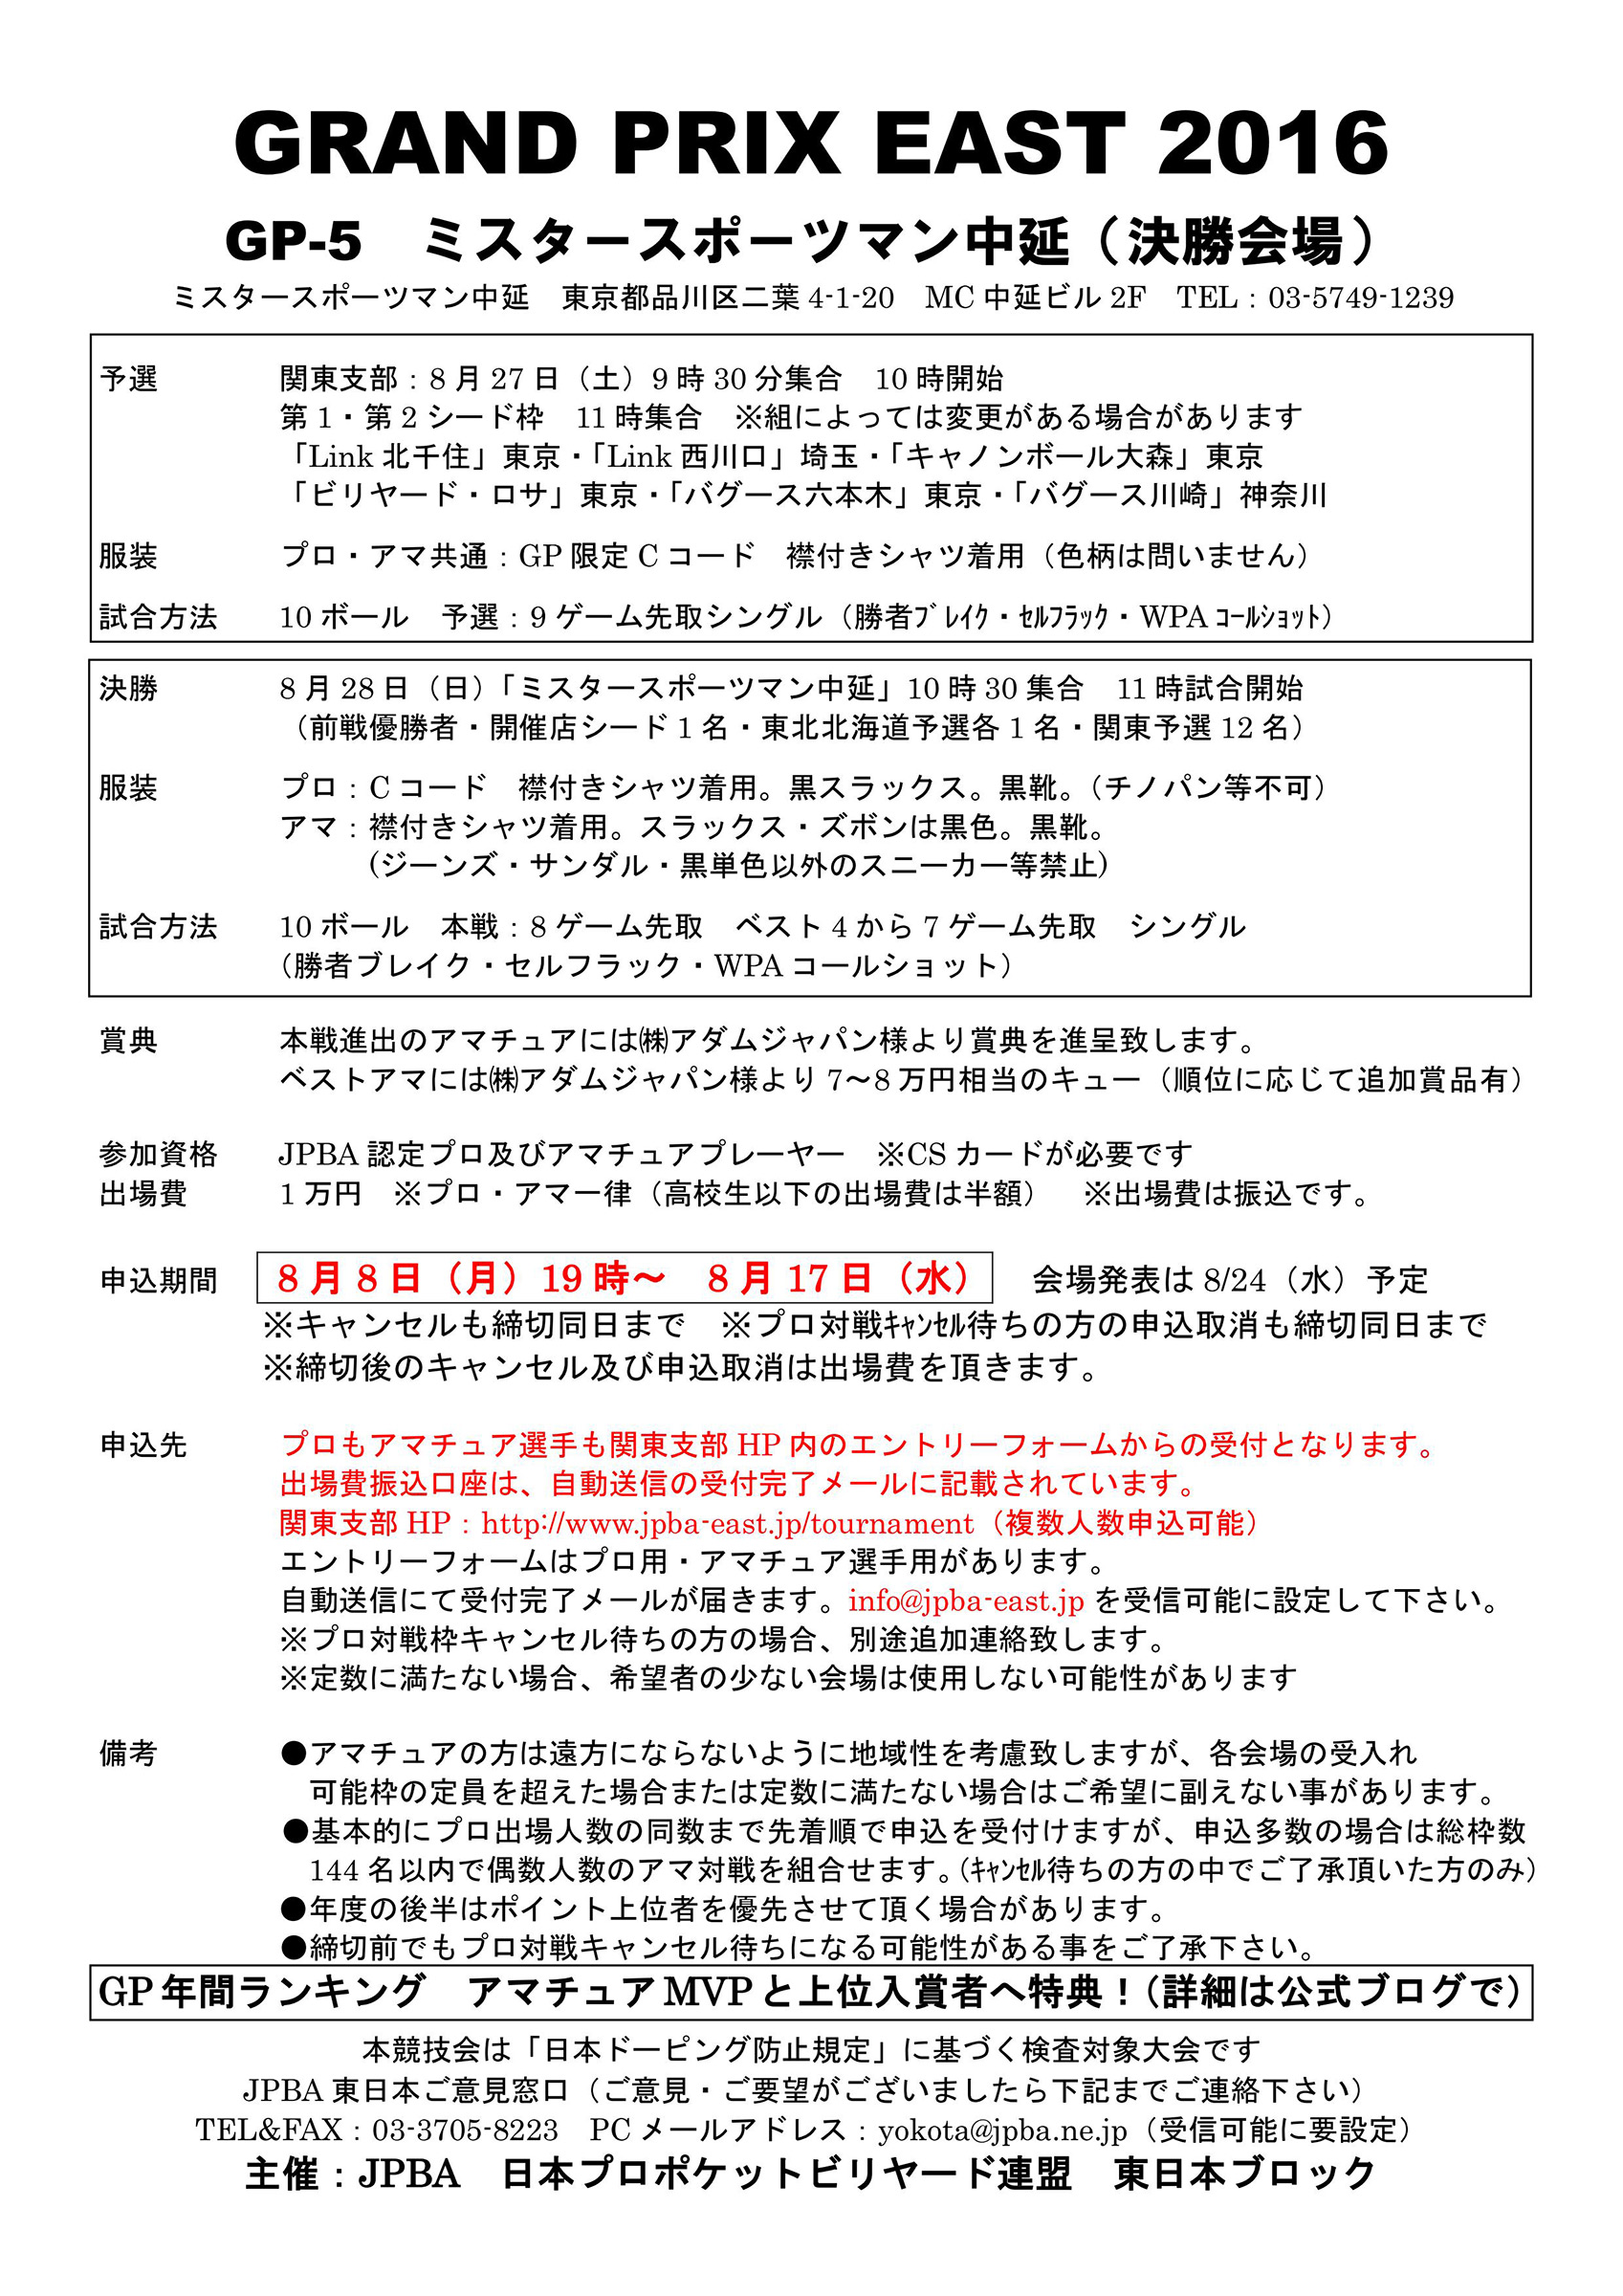 GP2016 GP5要項 ミスタースポーツマン中延_01